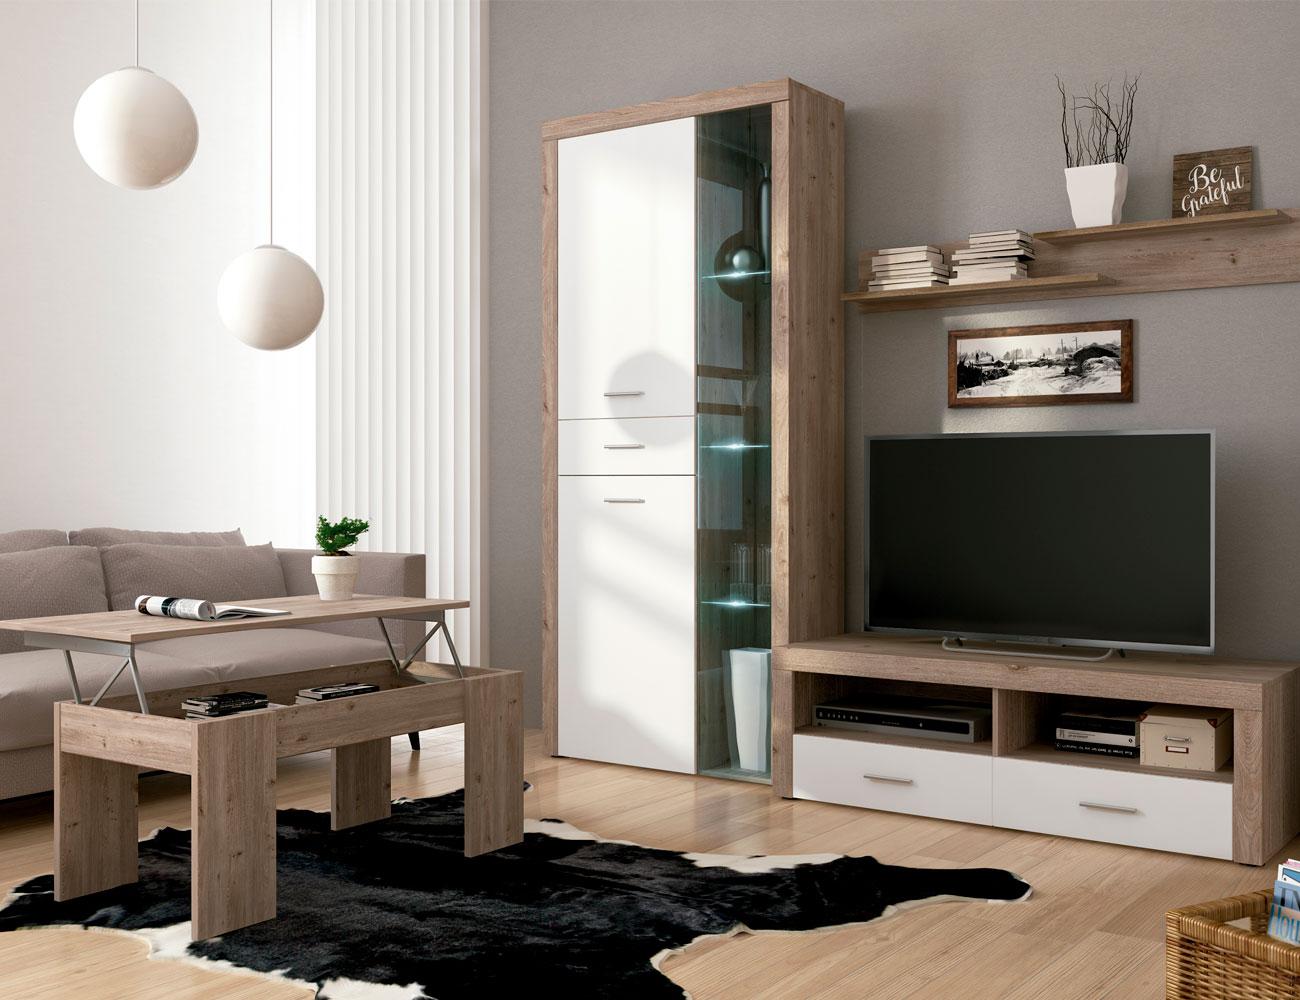 Mueble salon comedor vitrina bajo tv estante nelson blanco